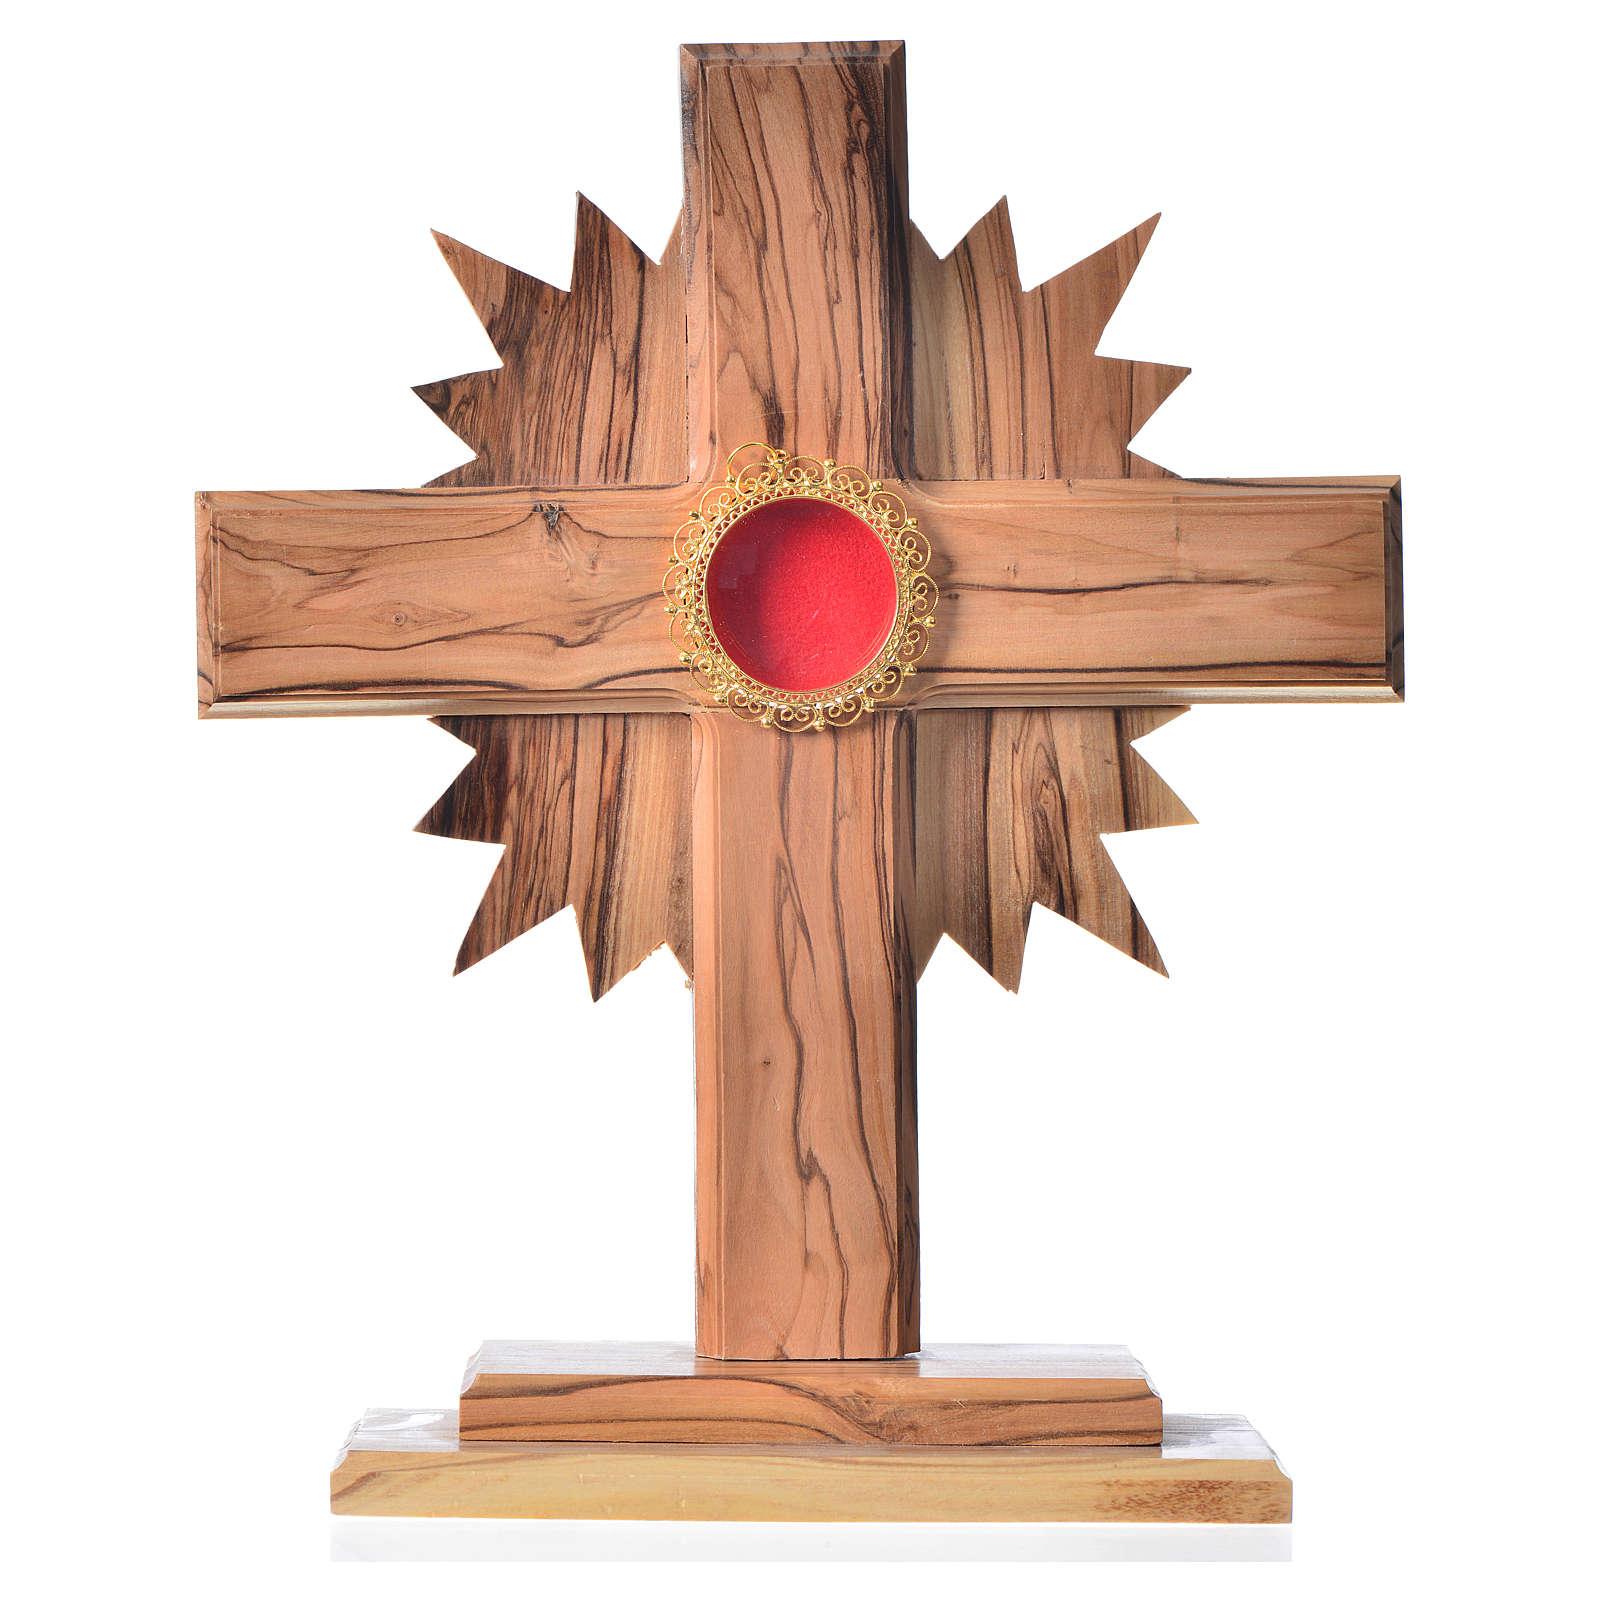 Relicario olivo 20cm, cruz con rayos custodia plata 800 redonda 4